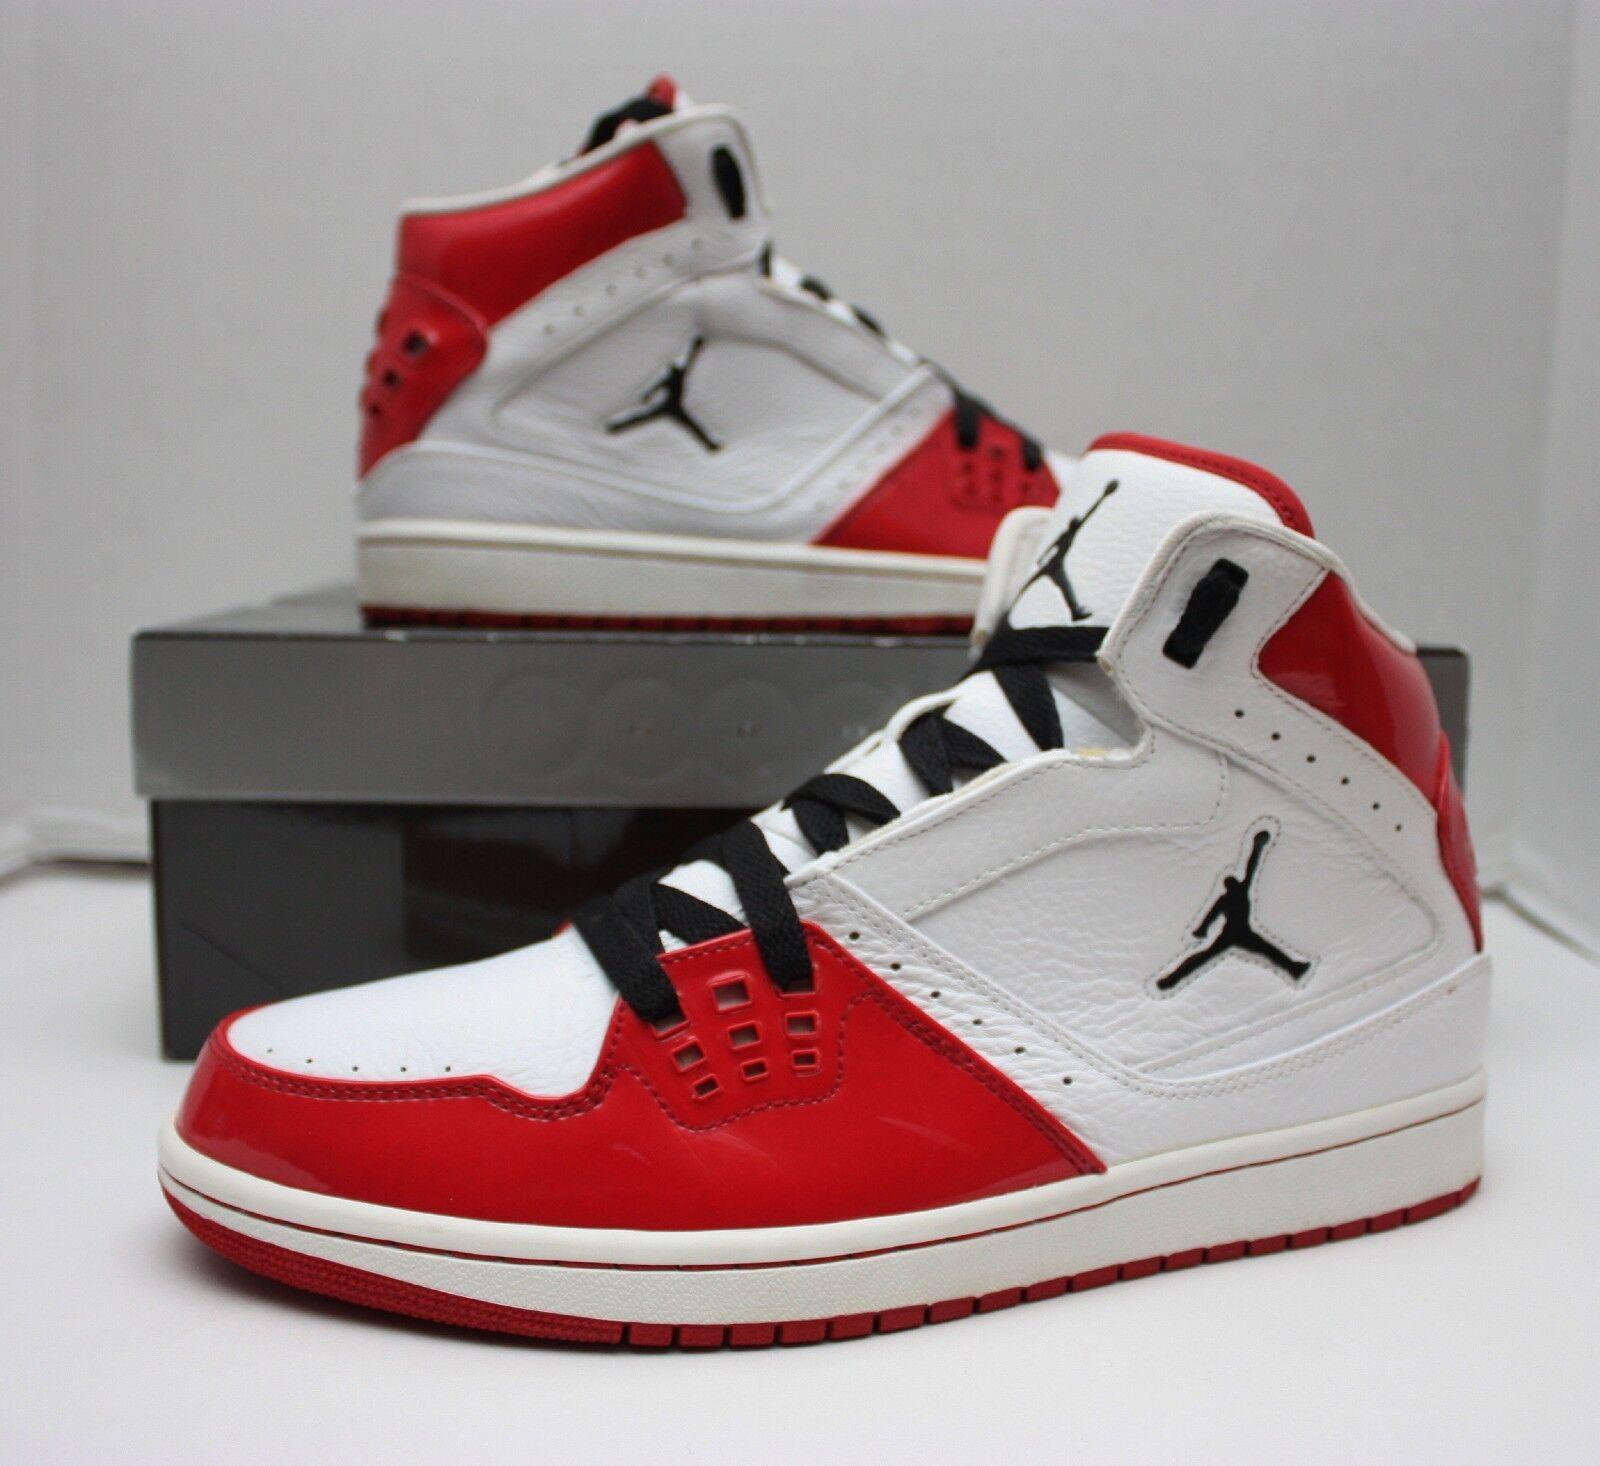 Nike Air Jordan 1 Flight Size 11 White - Chicago Home - White 11 Red Black - 372704 101 10222b